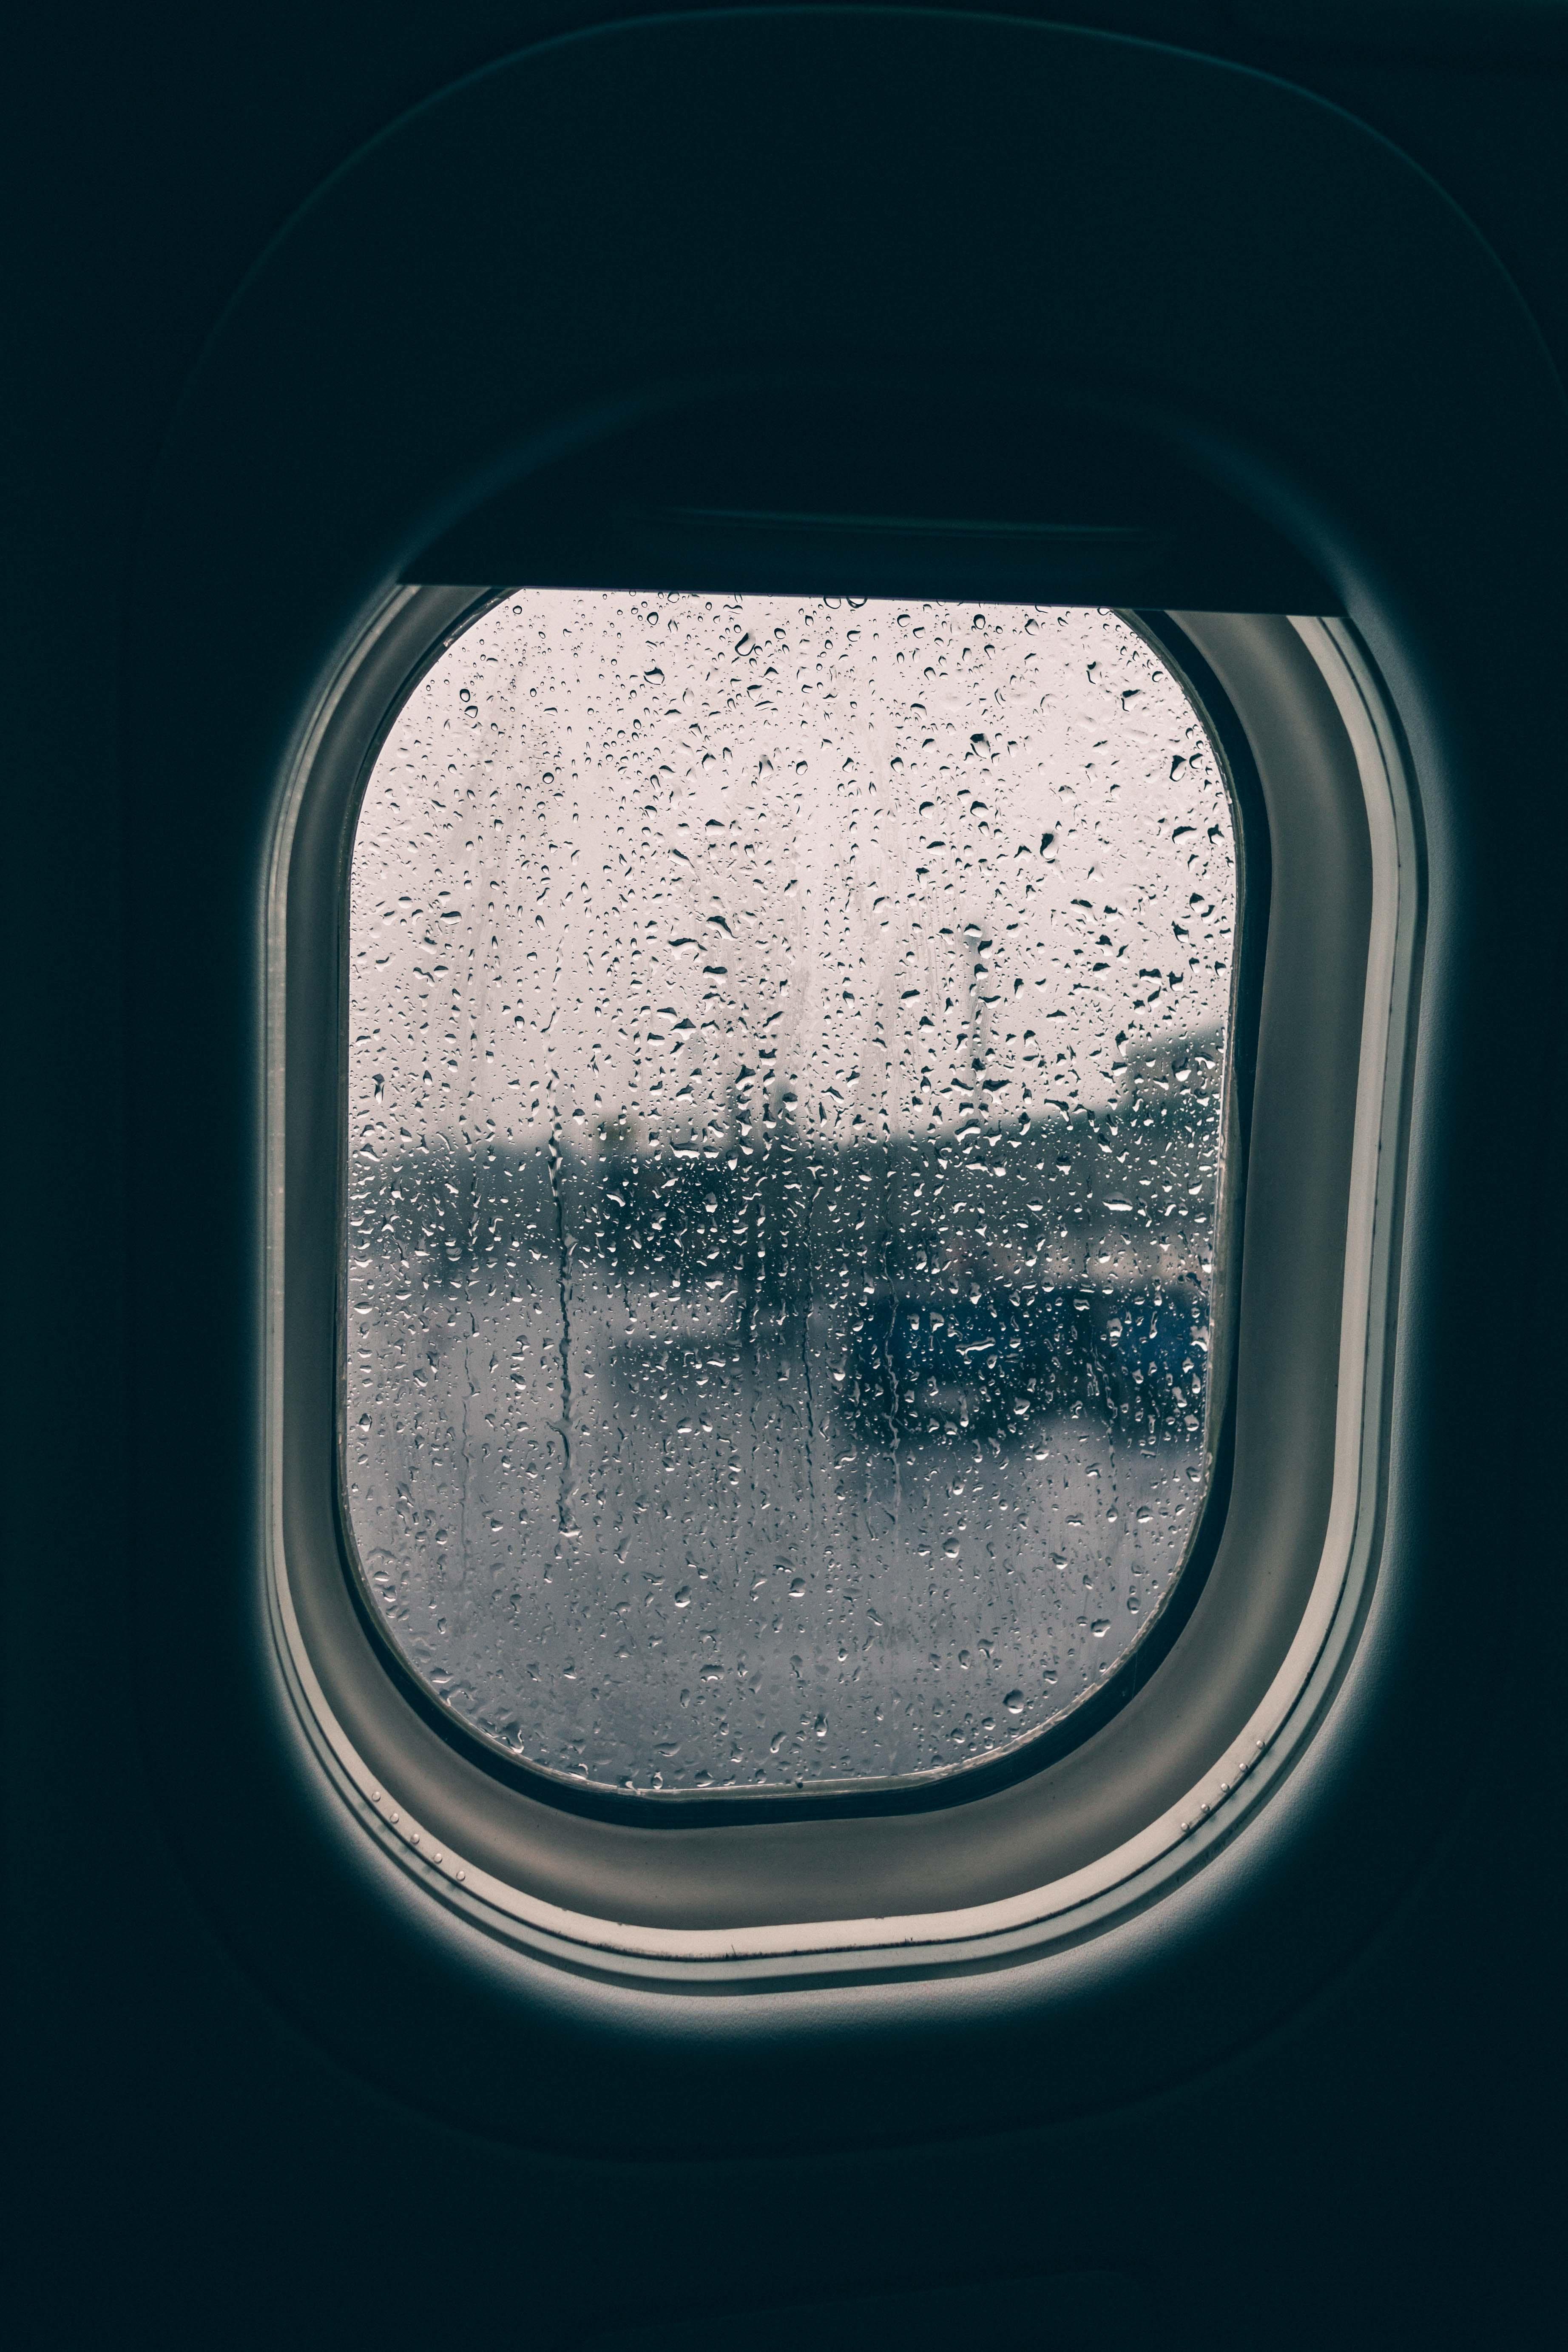 clear glass plane window full of rain droplets